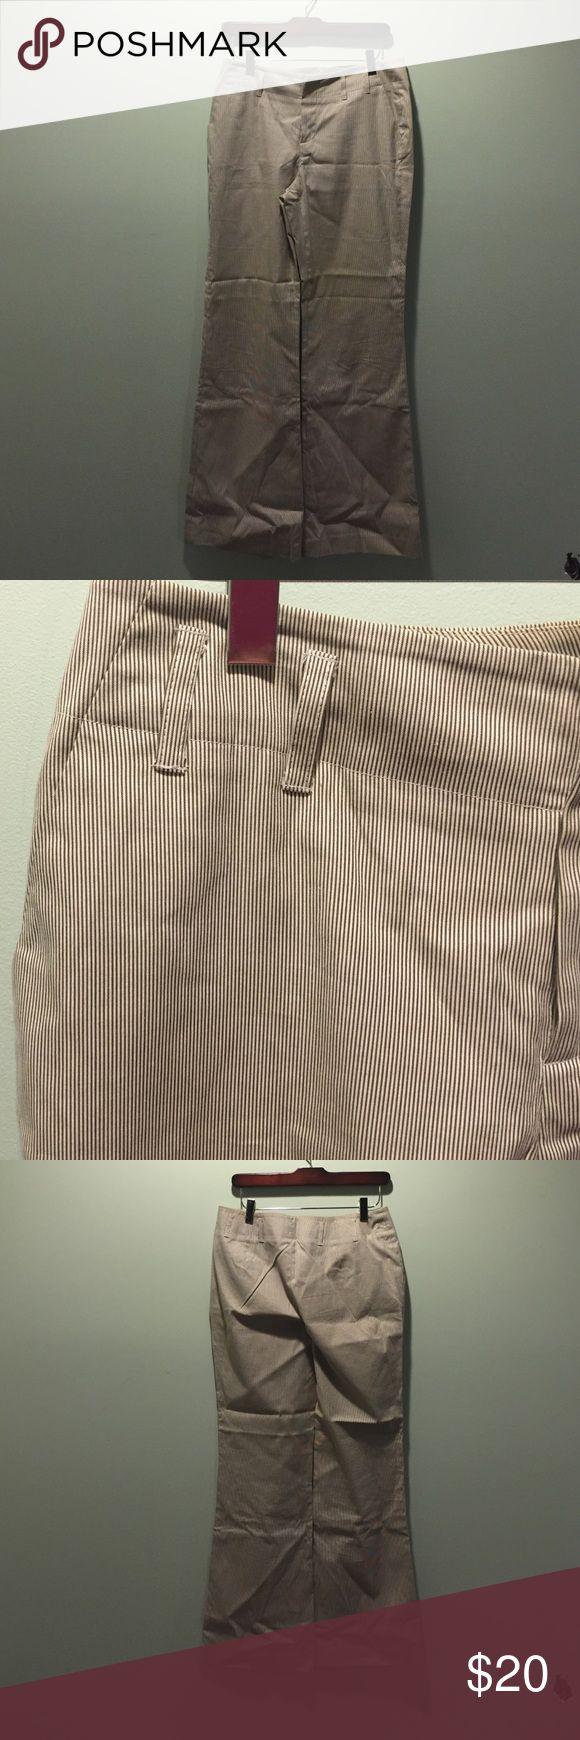 EUC Banana Republic Size 6 Seersucker pants EUC Blue/White Banana Republic Size 6 Seersucker pants. Goes with blazer/vest, listed separately. 100% cotton. Banana Republic Pants Trousers